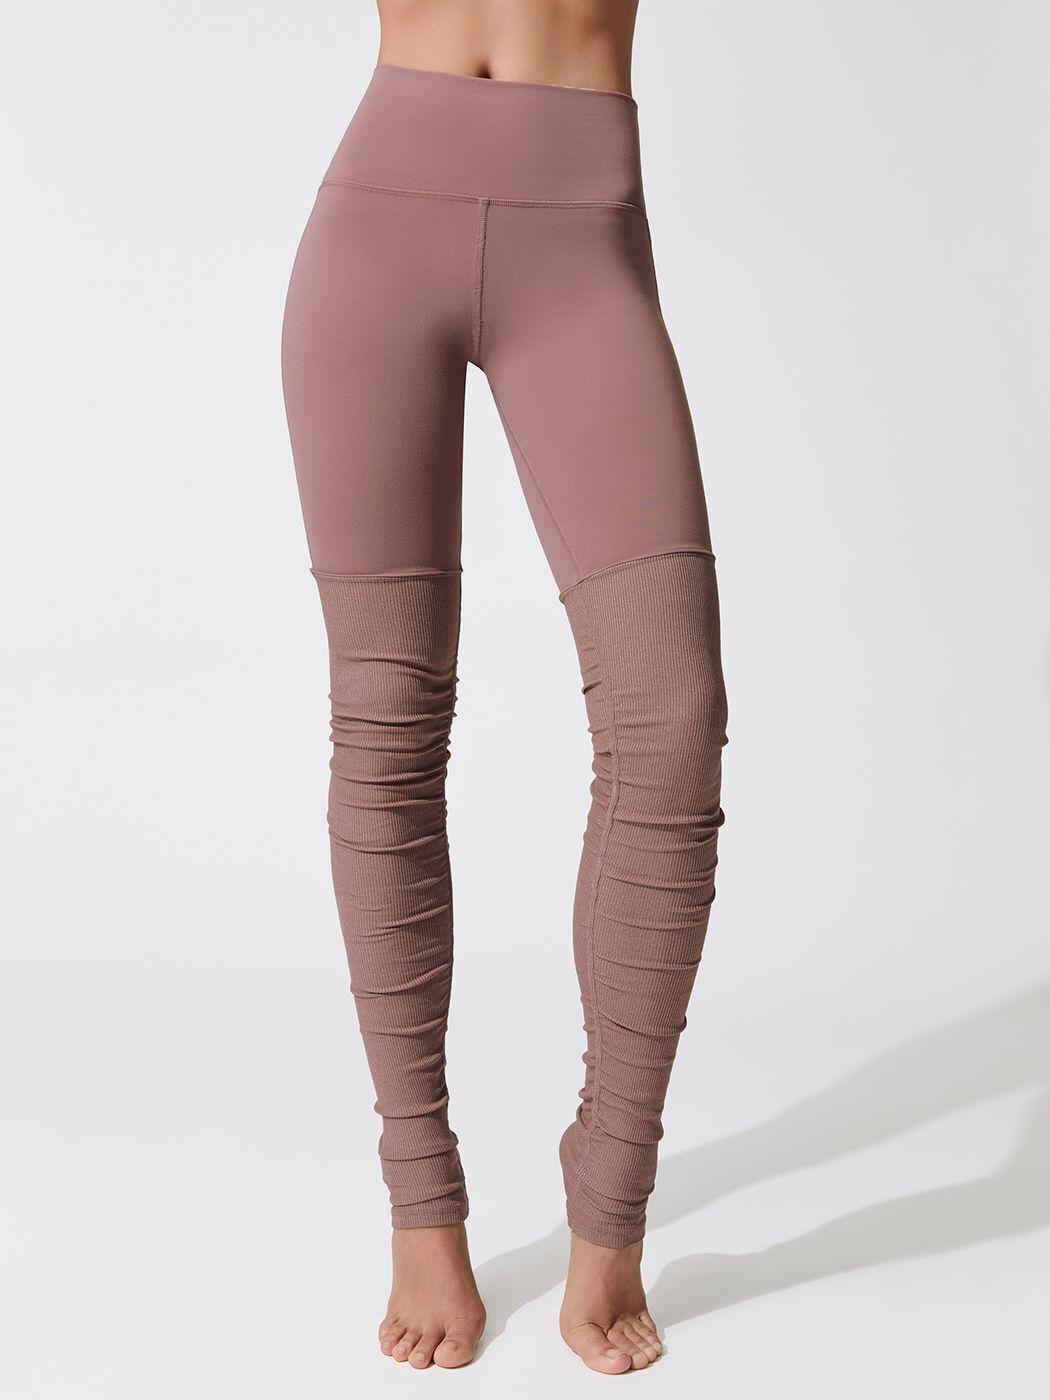 b2114129270fa Alo Yoga High-Waist Goddess Legging | Fitness | Style | Yoga leggings,  Fashion, Leggings